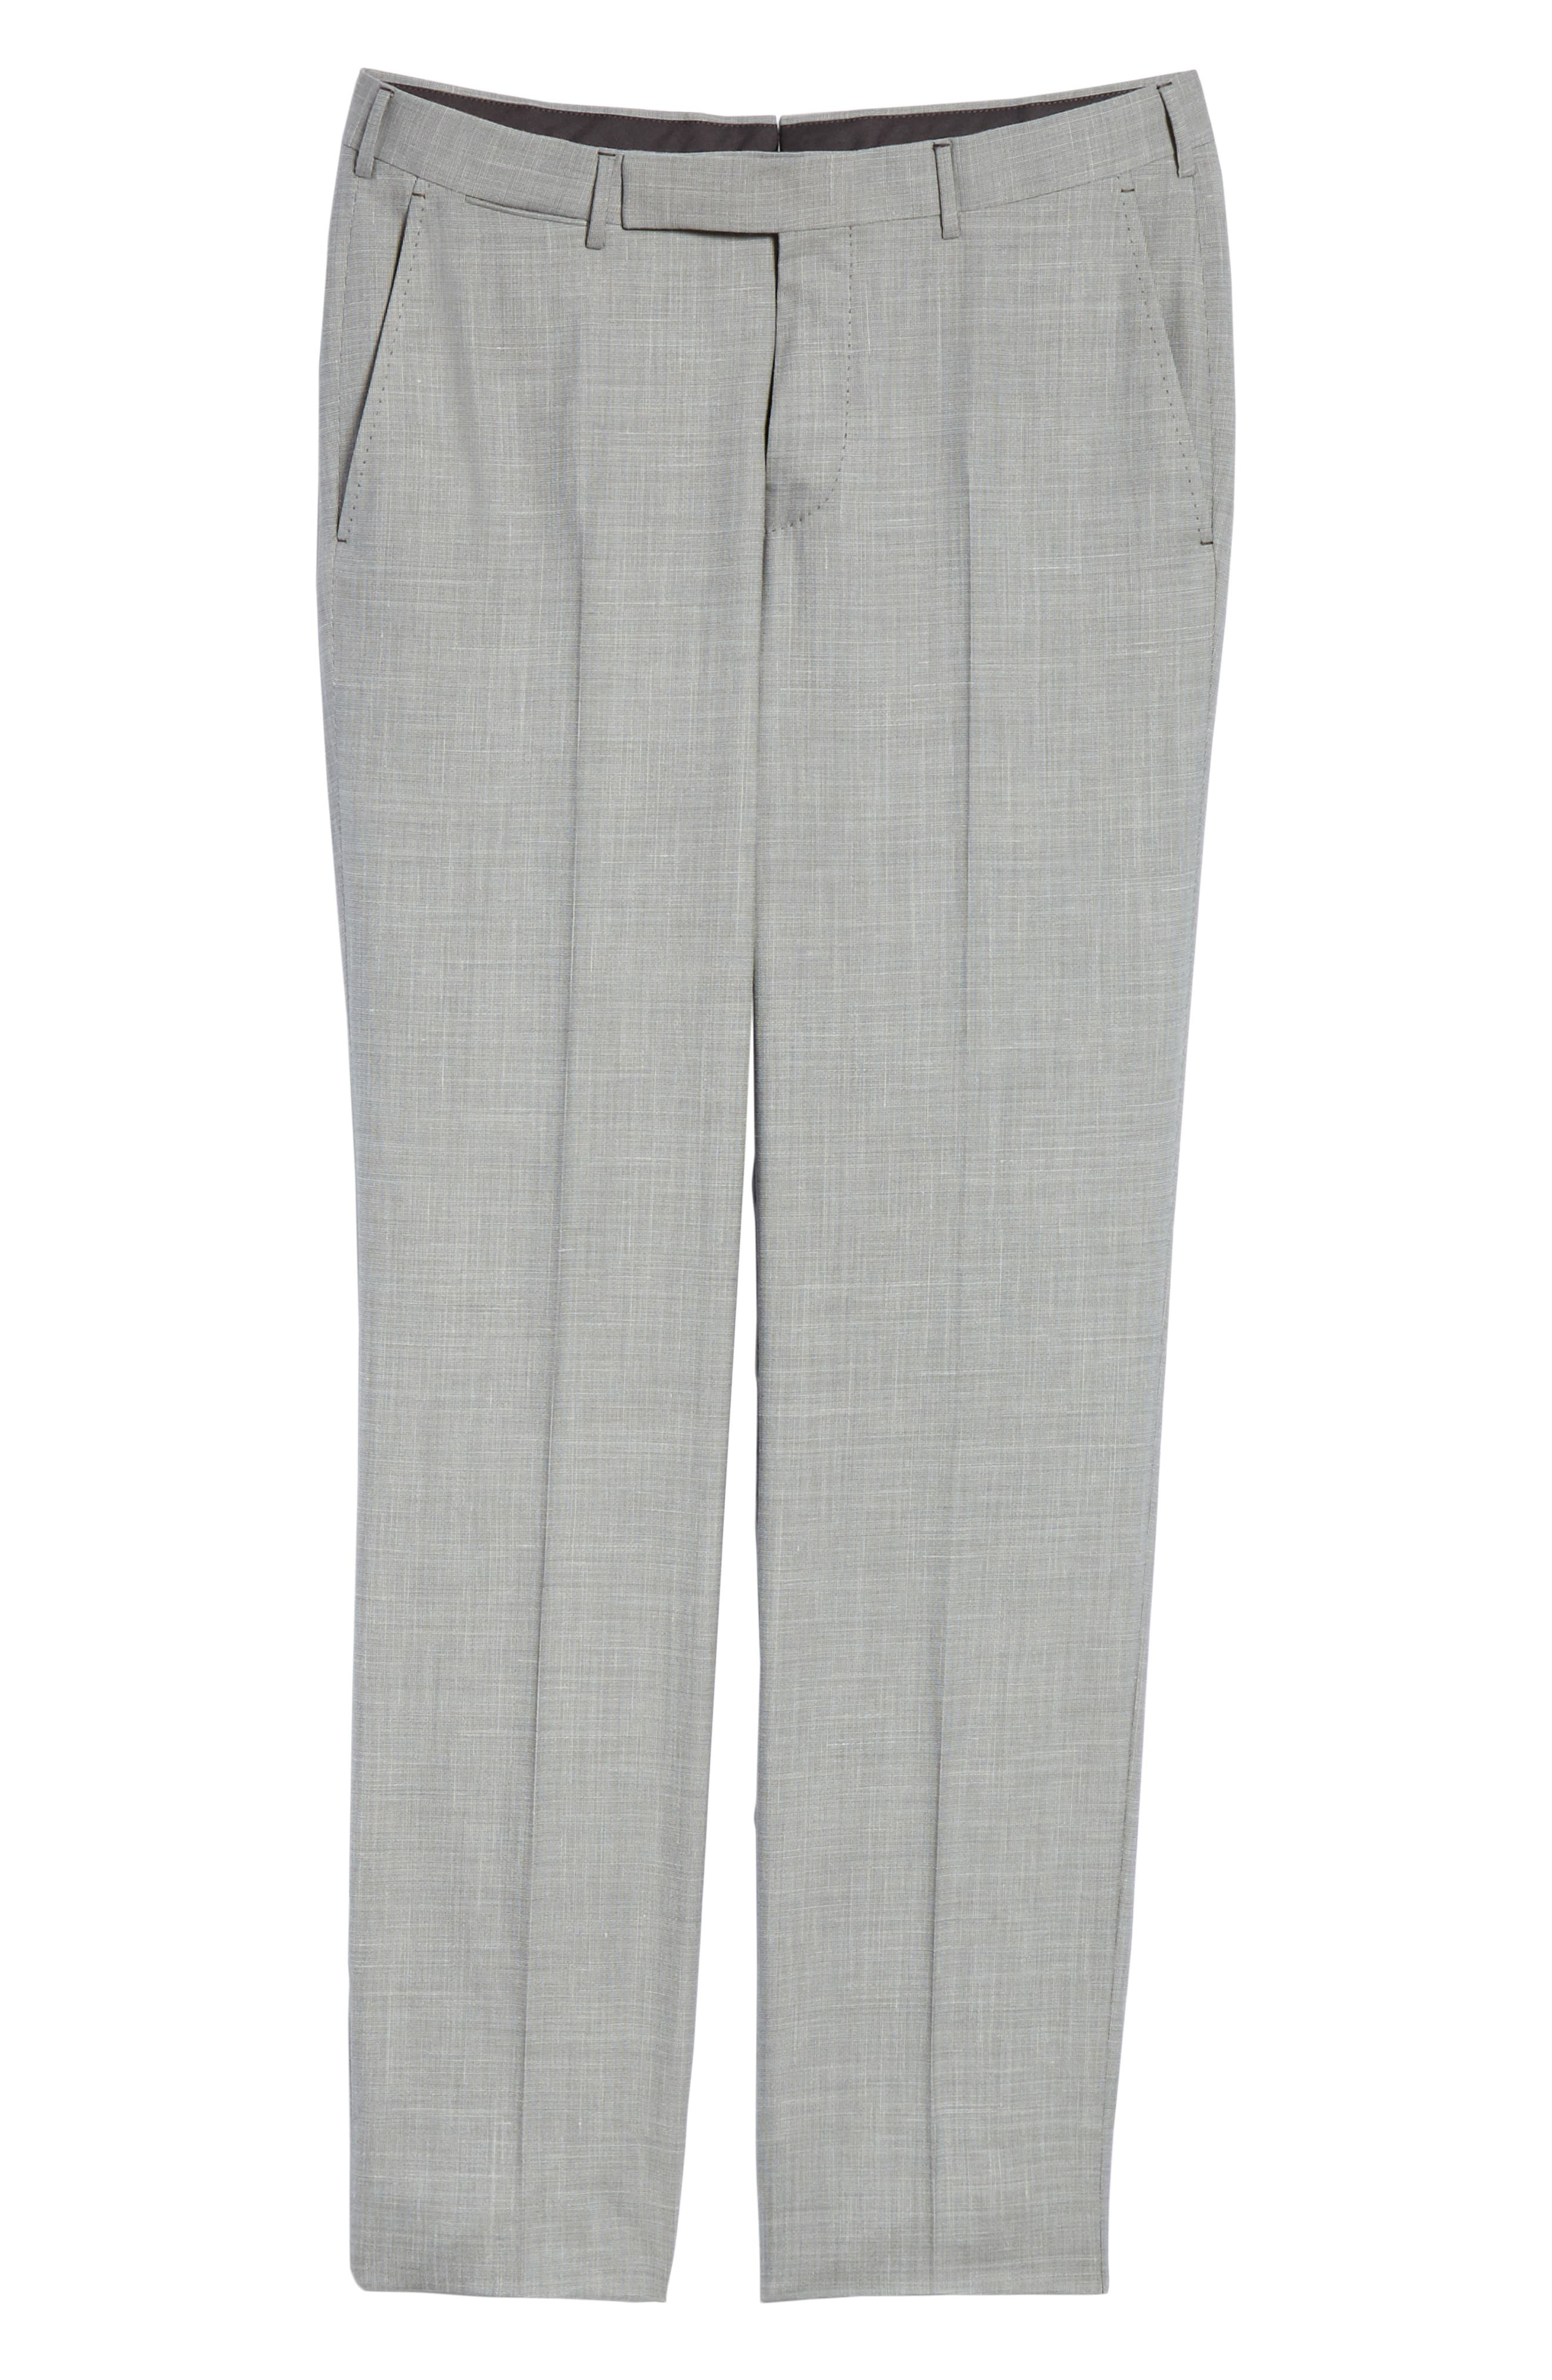 ERMENEGILDO ZEGNA, Trofeo Flat Front Solid Wool Blend Trousers, Alternate thumbnail 6, color, LIGHT GREY